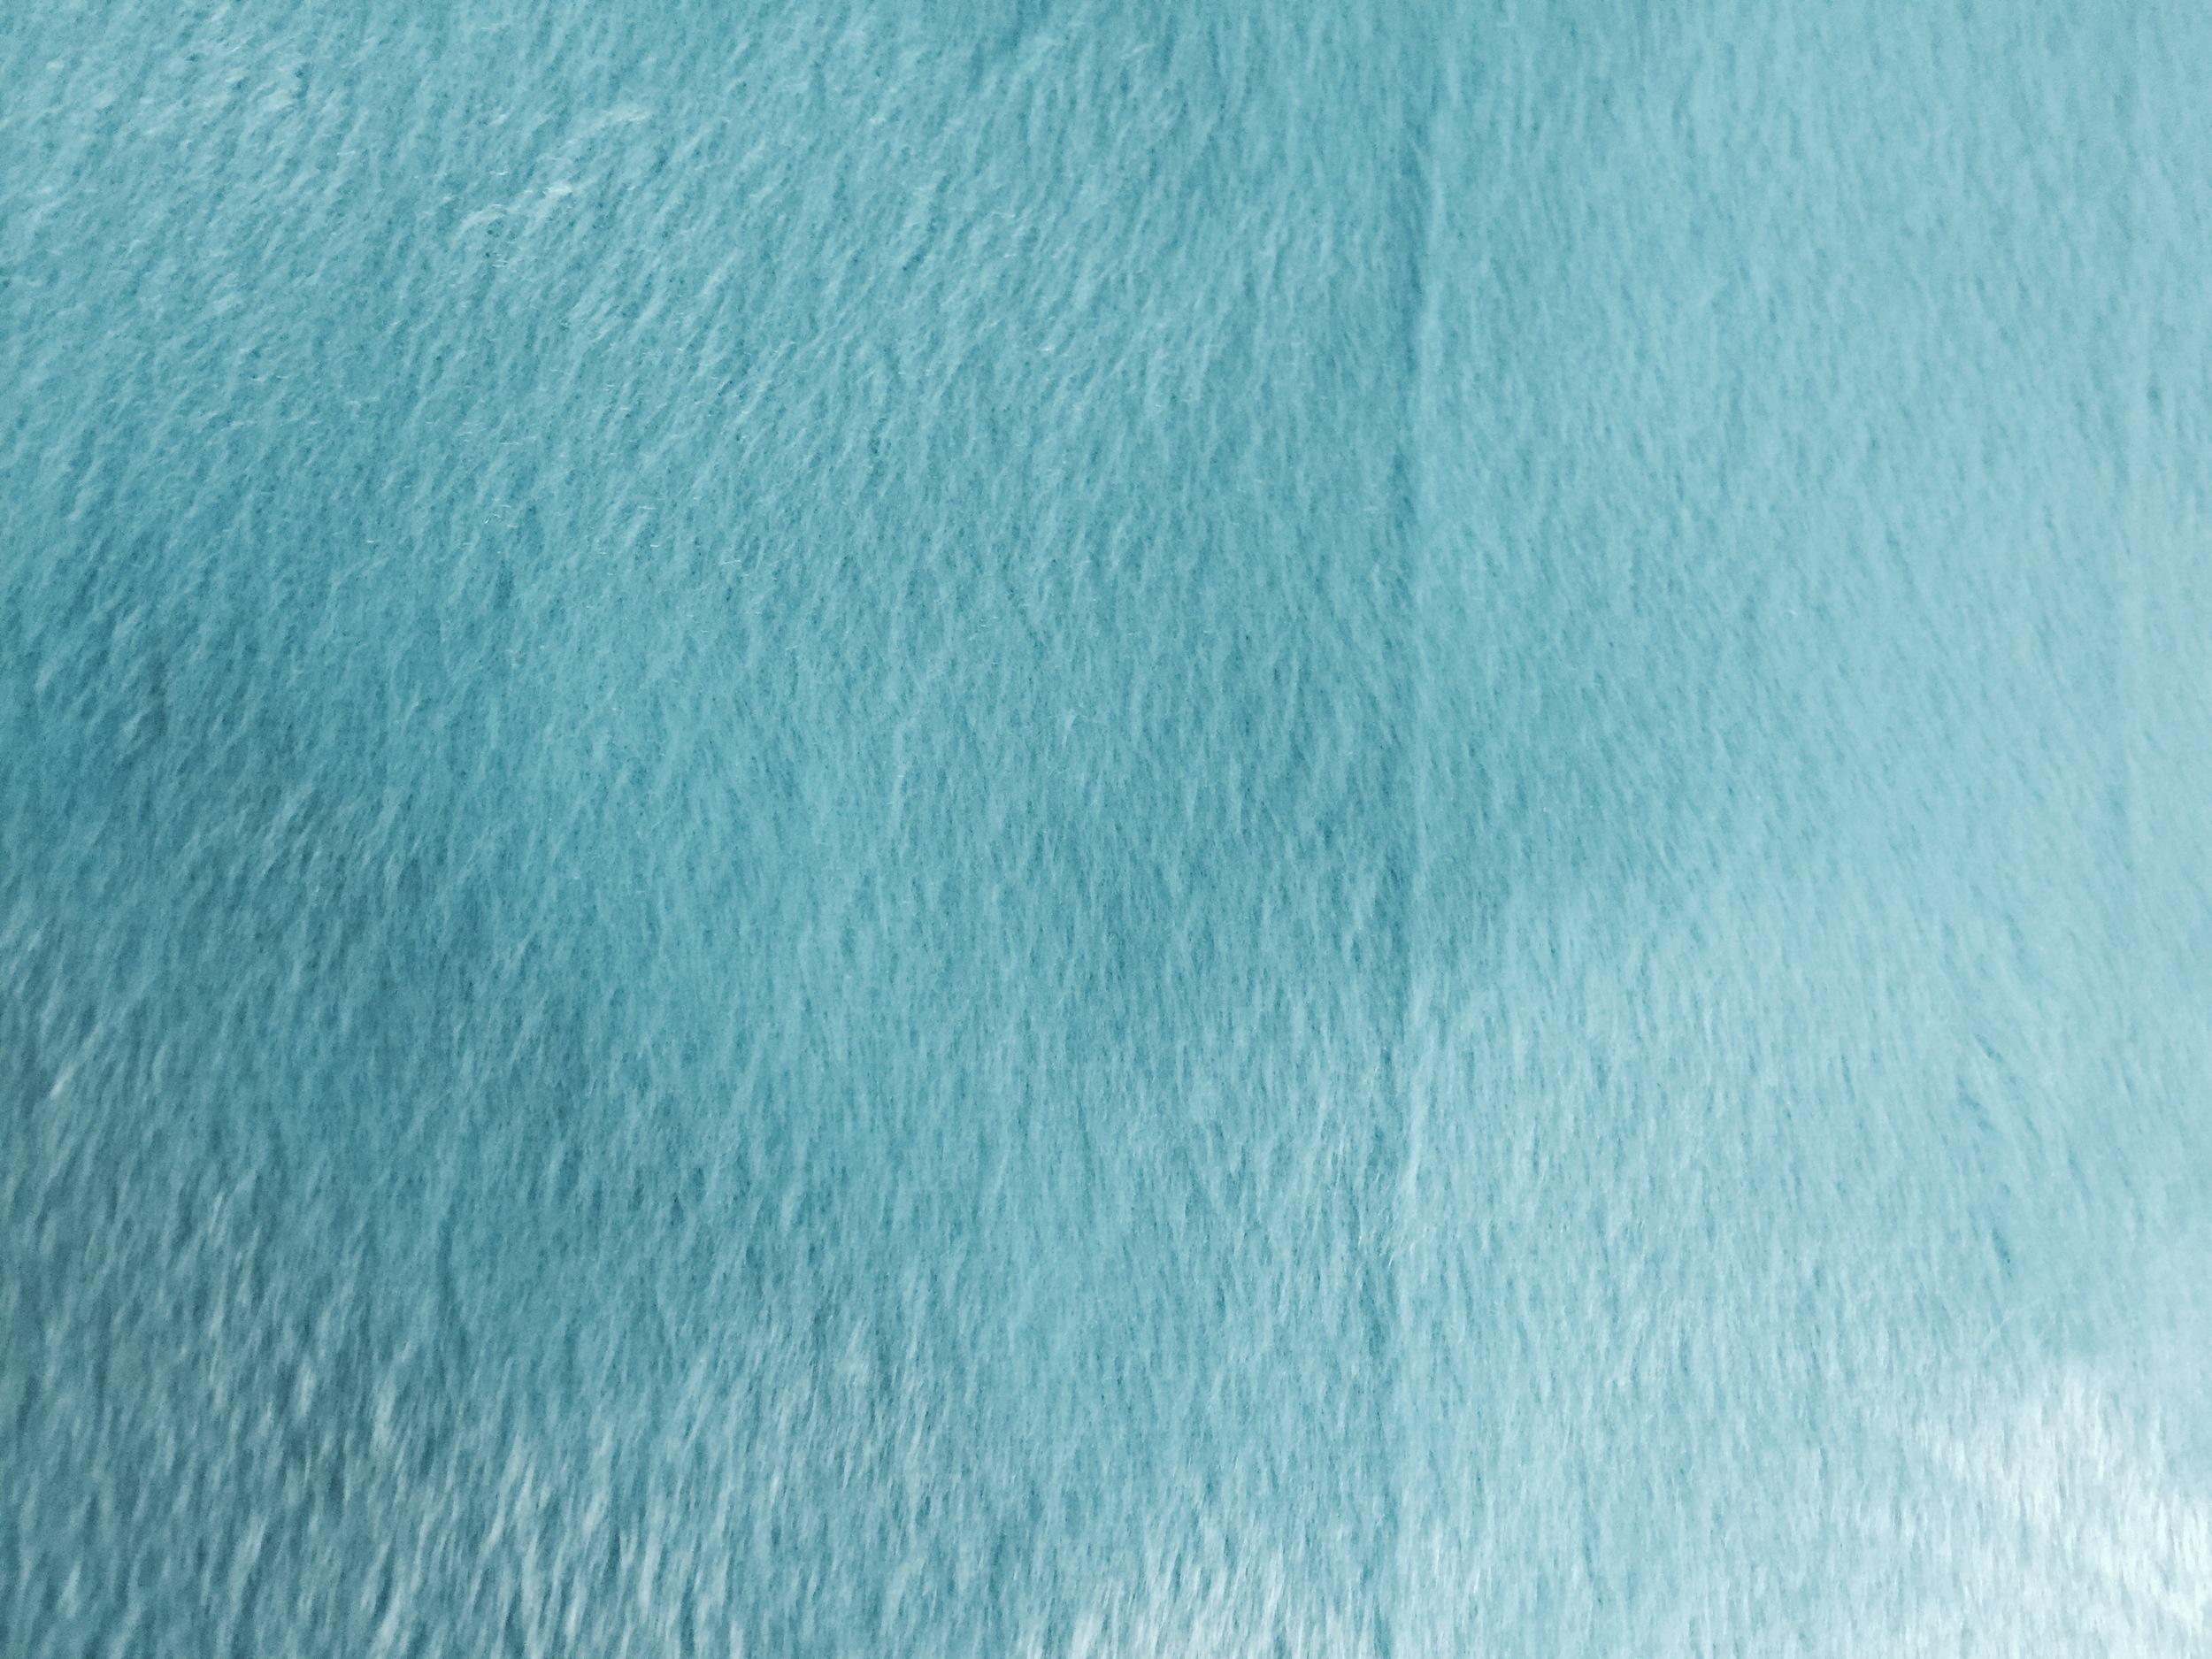 Turquoisemediumcover].jpg